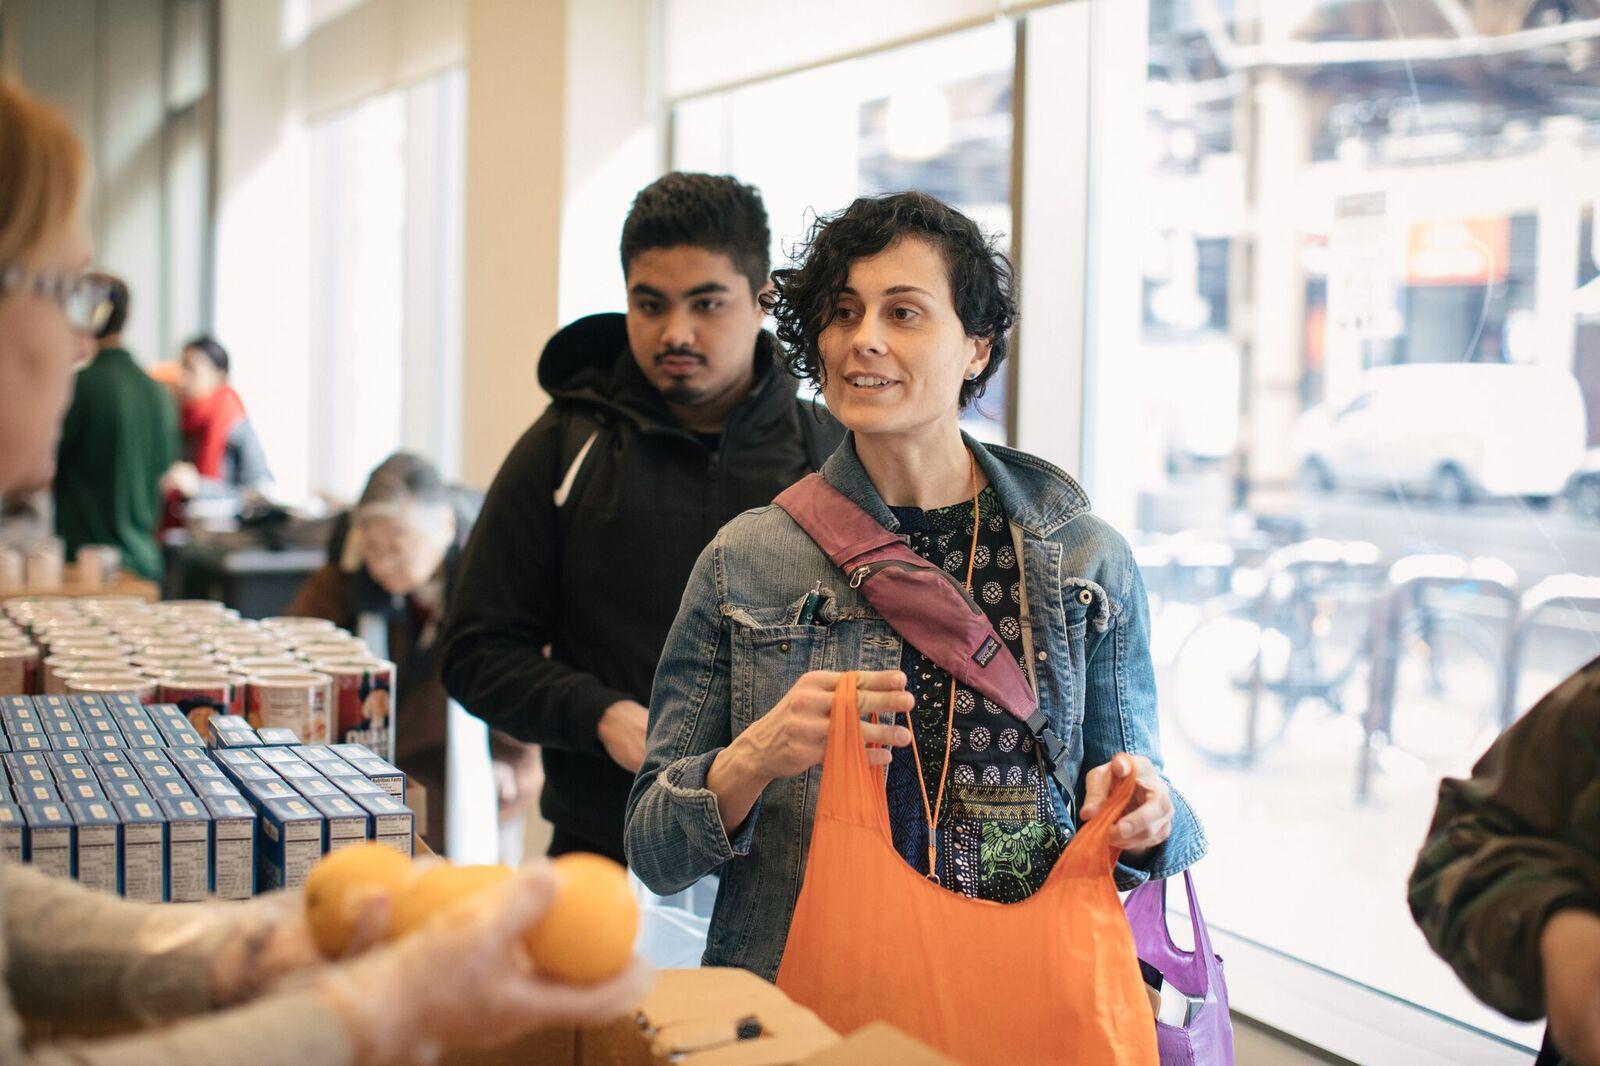 Students take advantage of a food pantry at Harold Washington College in May, 2019.